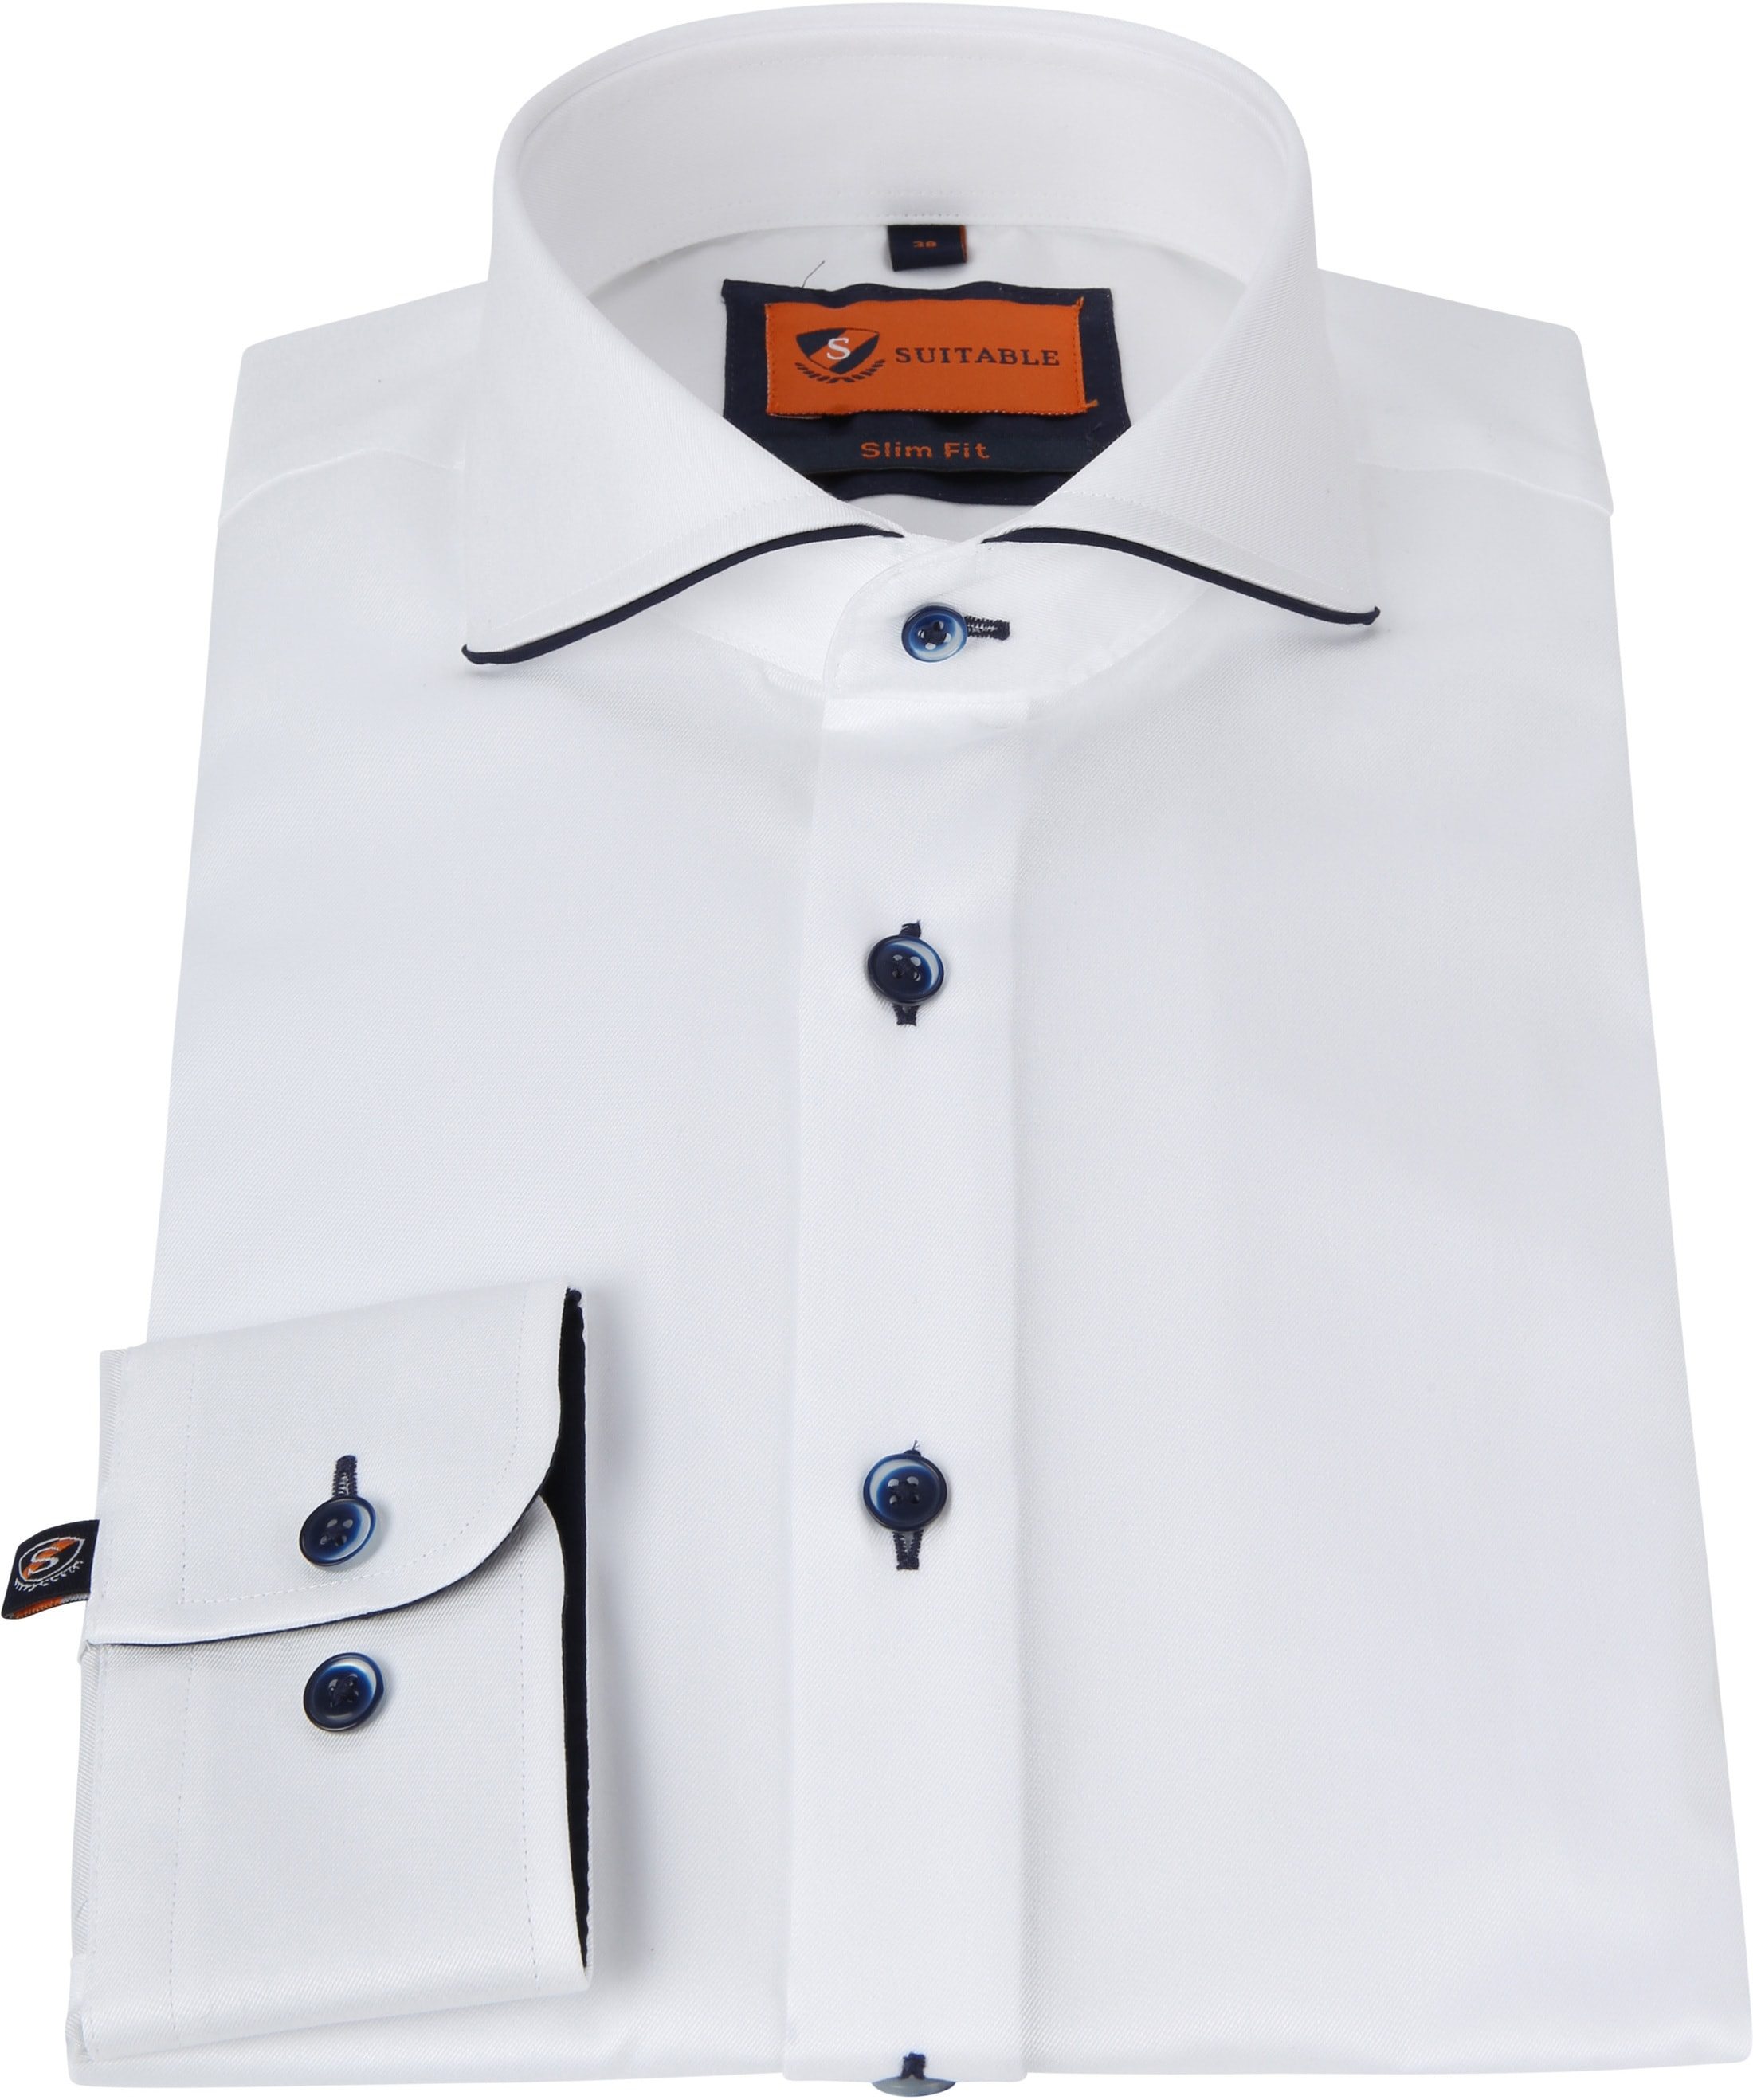 Suitable Overhemd Smart Wit foto 2